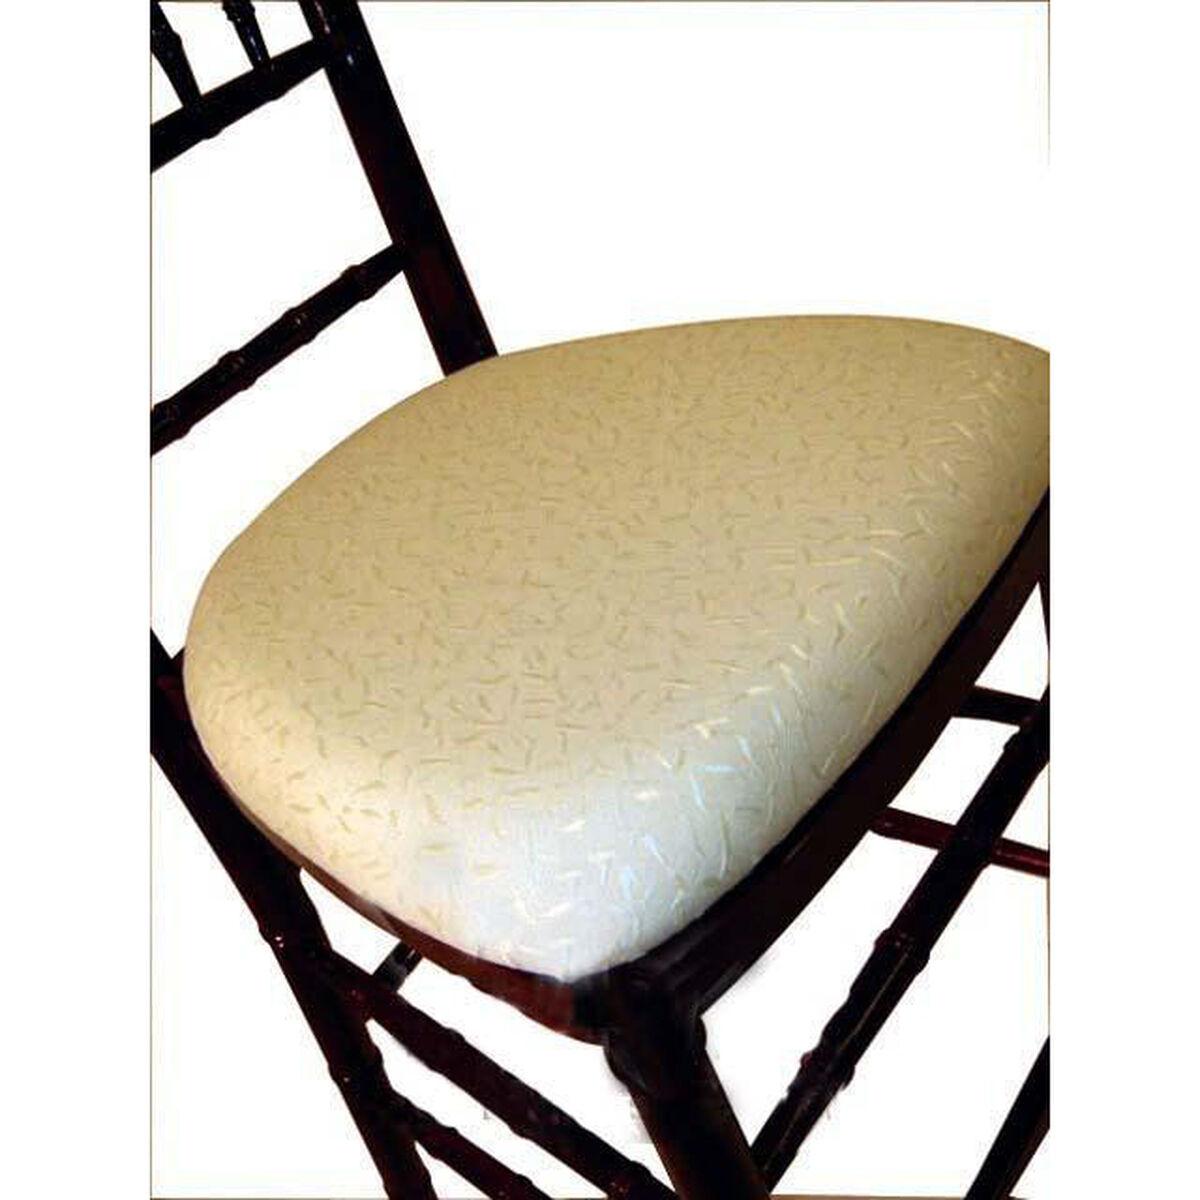 Ballroom Ivory Seat Pad 121315 Restaurantfurniture4less Com